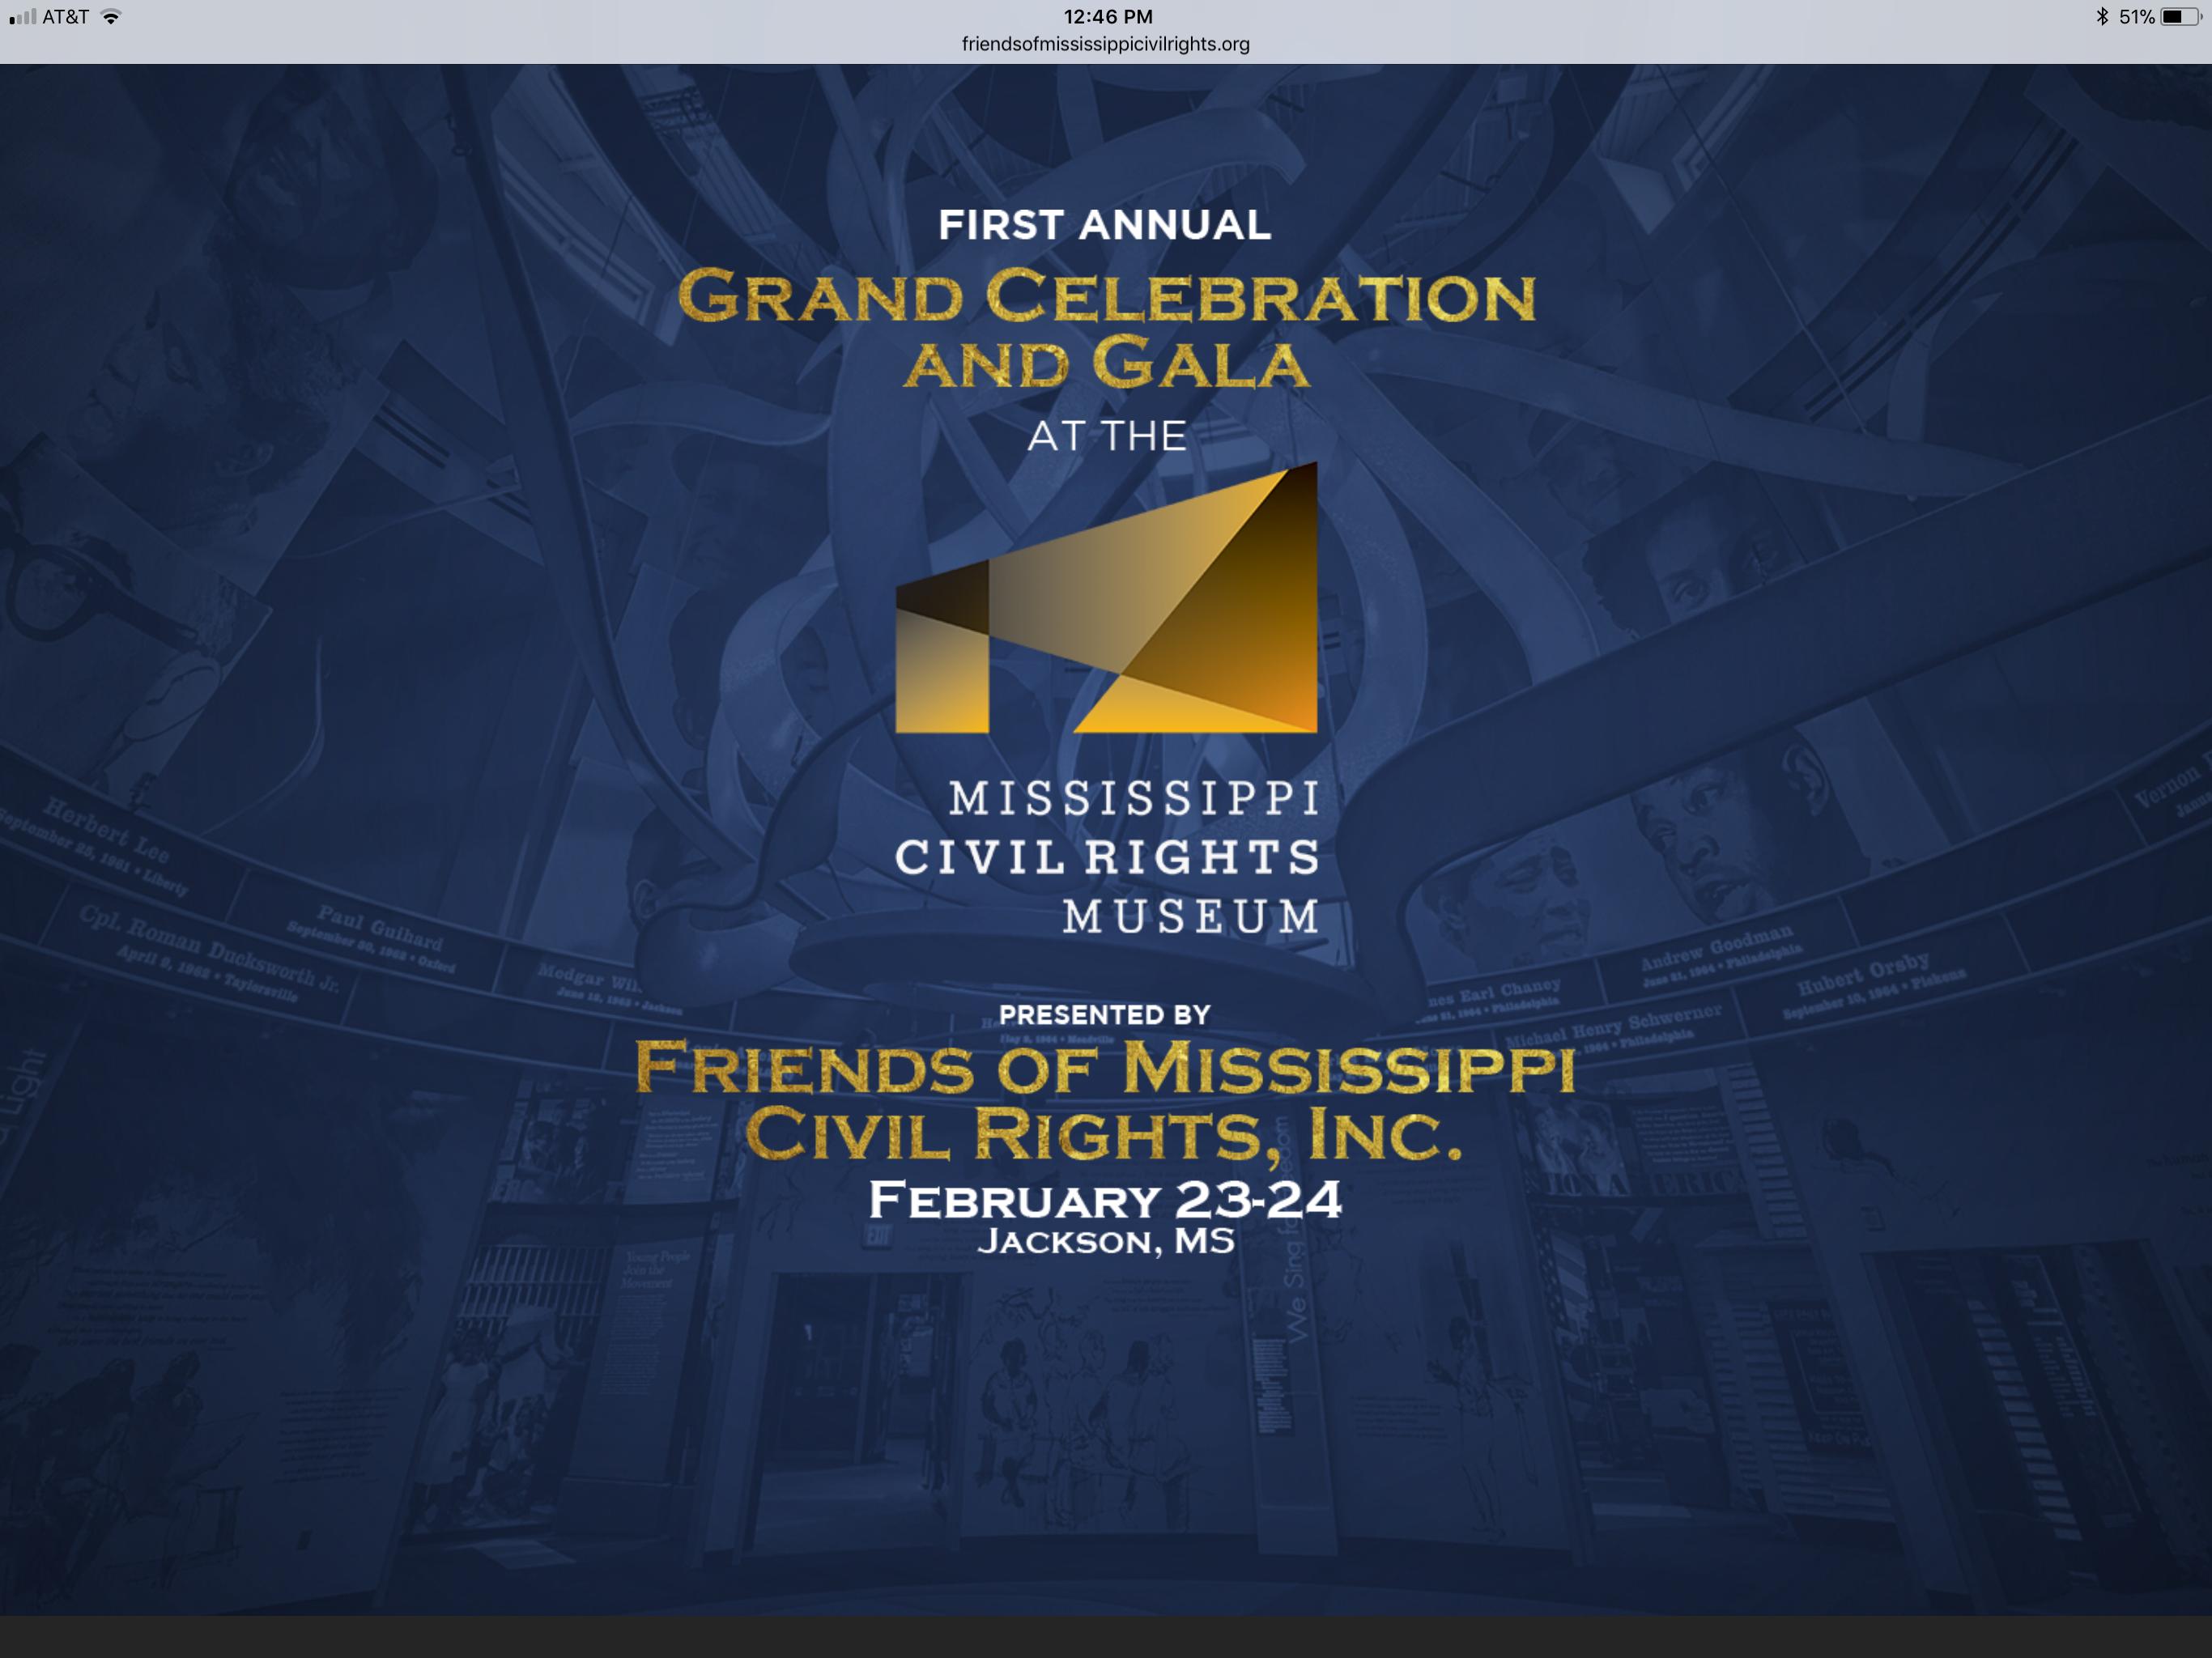 Grand Celebration & Gala